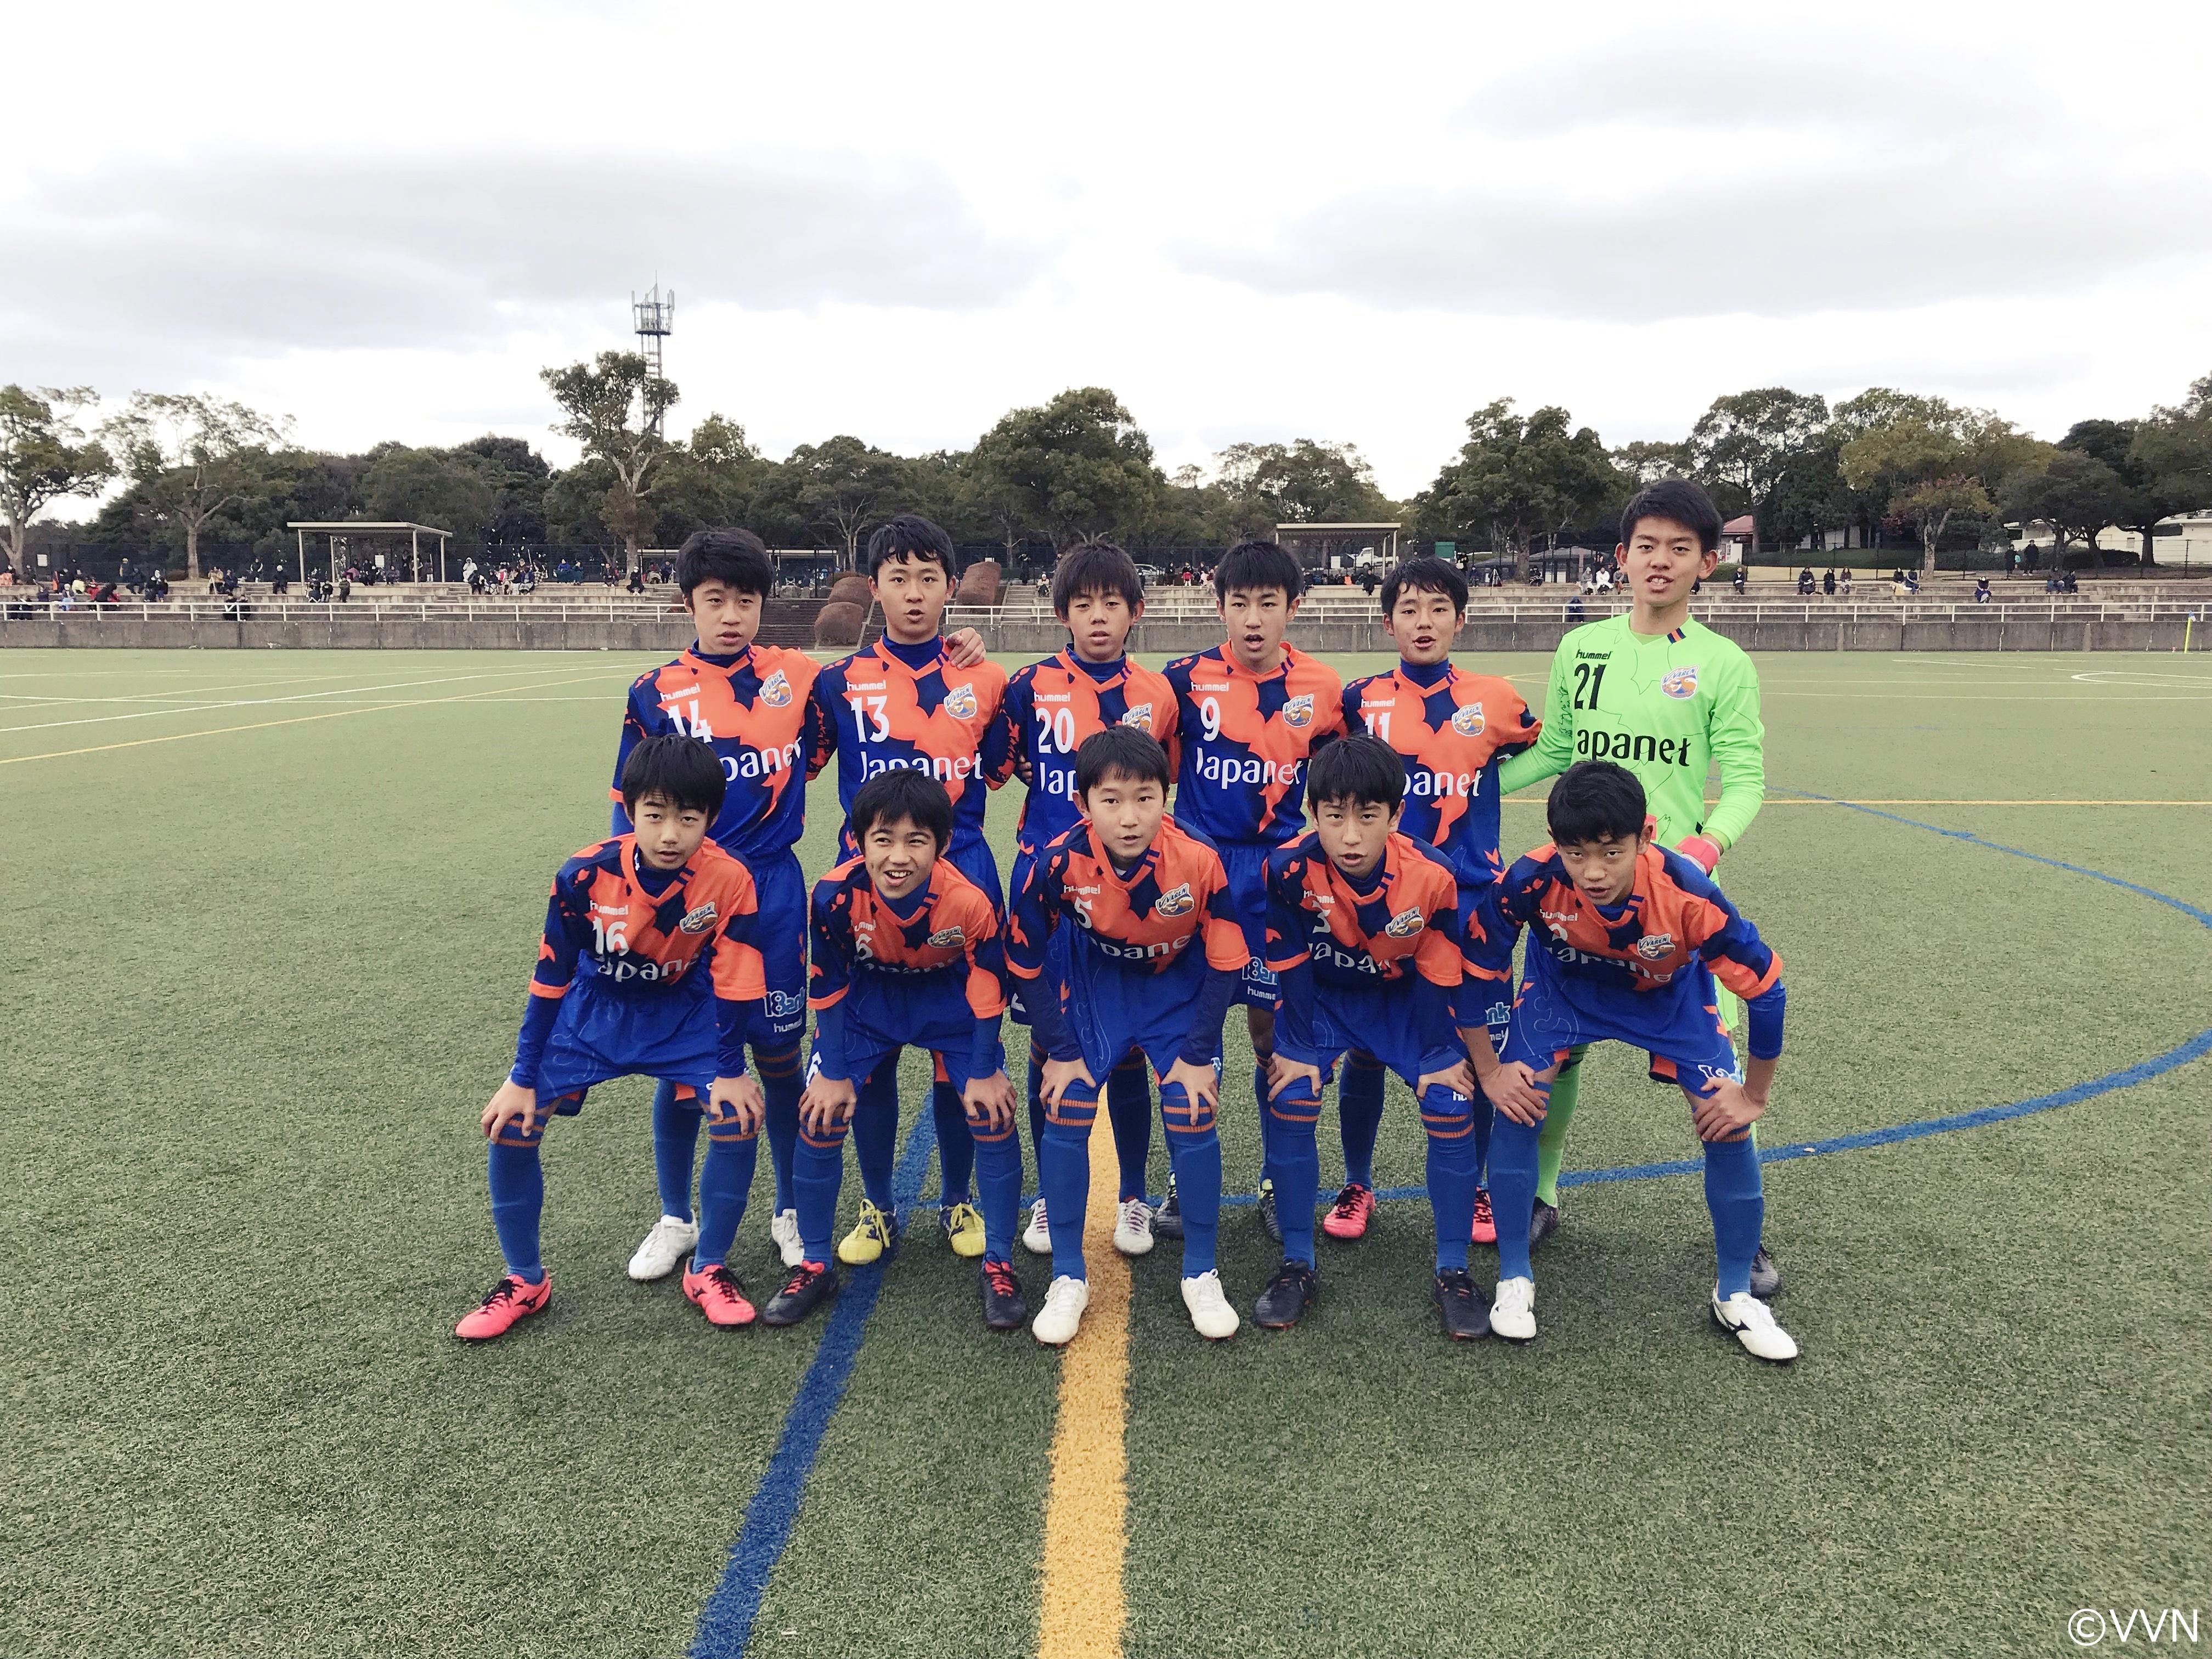 ≪U-15≫「2018年度 第26回長崎県クラブユース(U-14)サッカー大会」試合結果 サムネイル